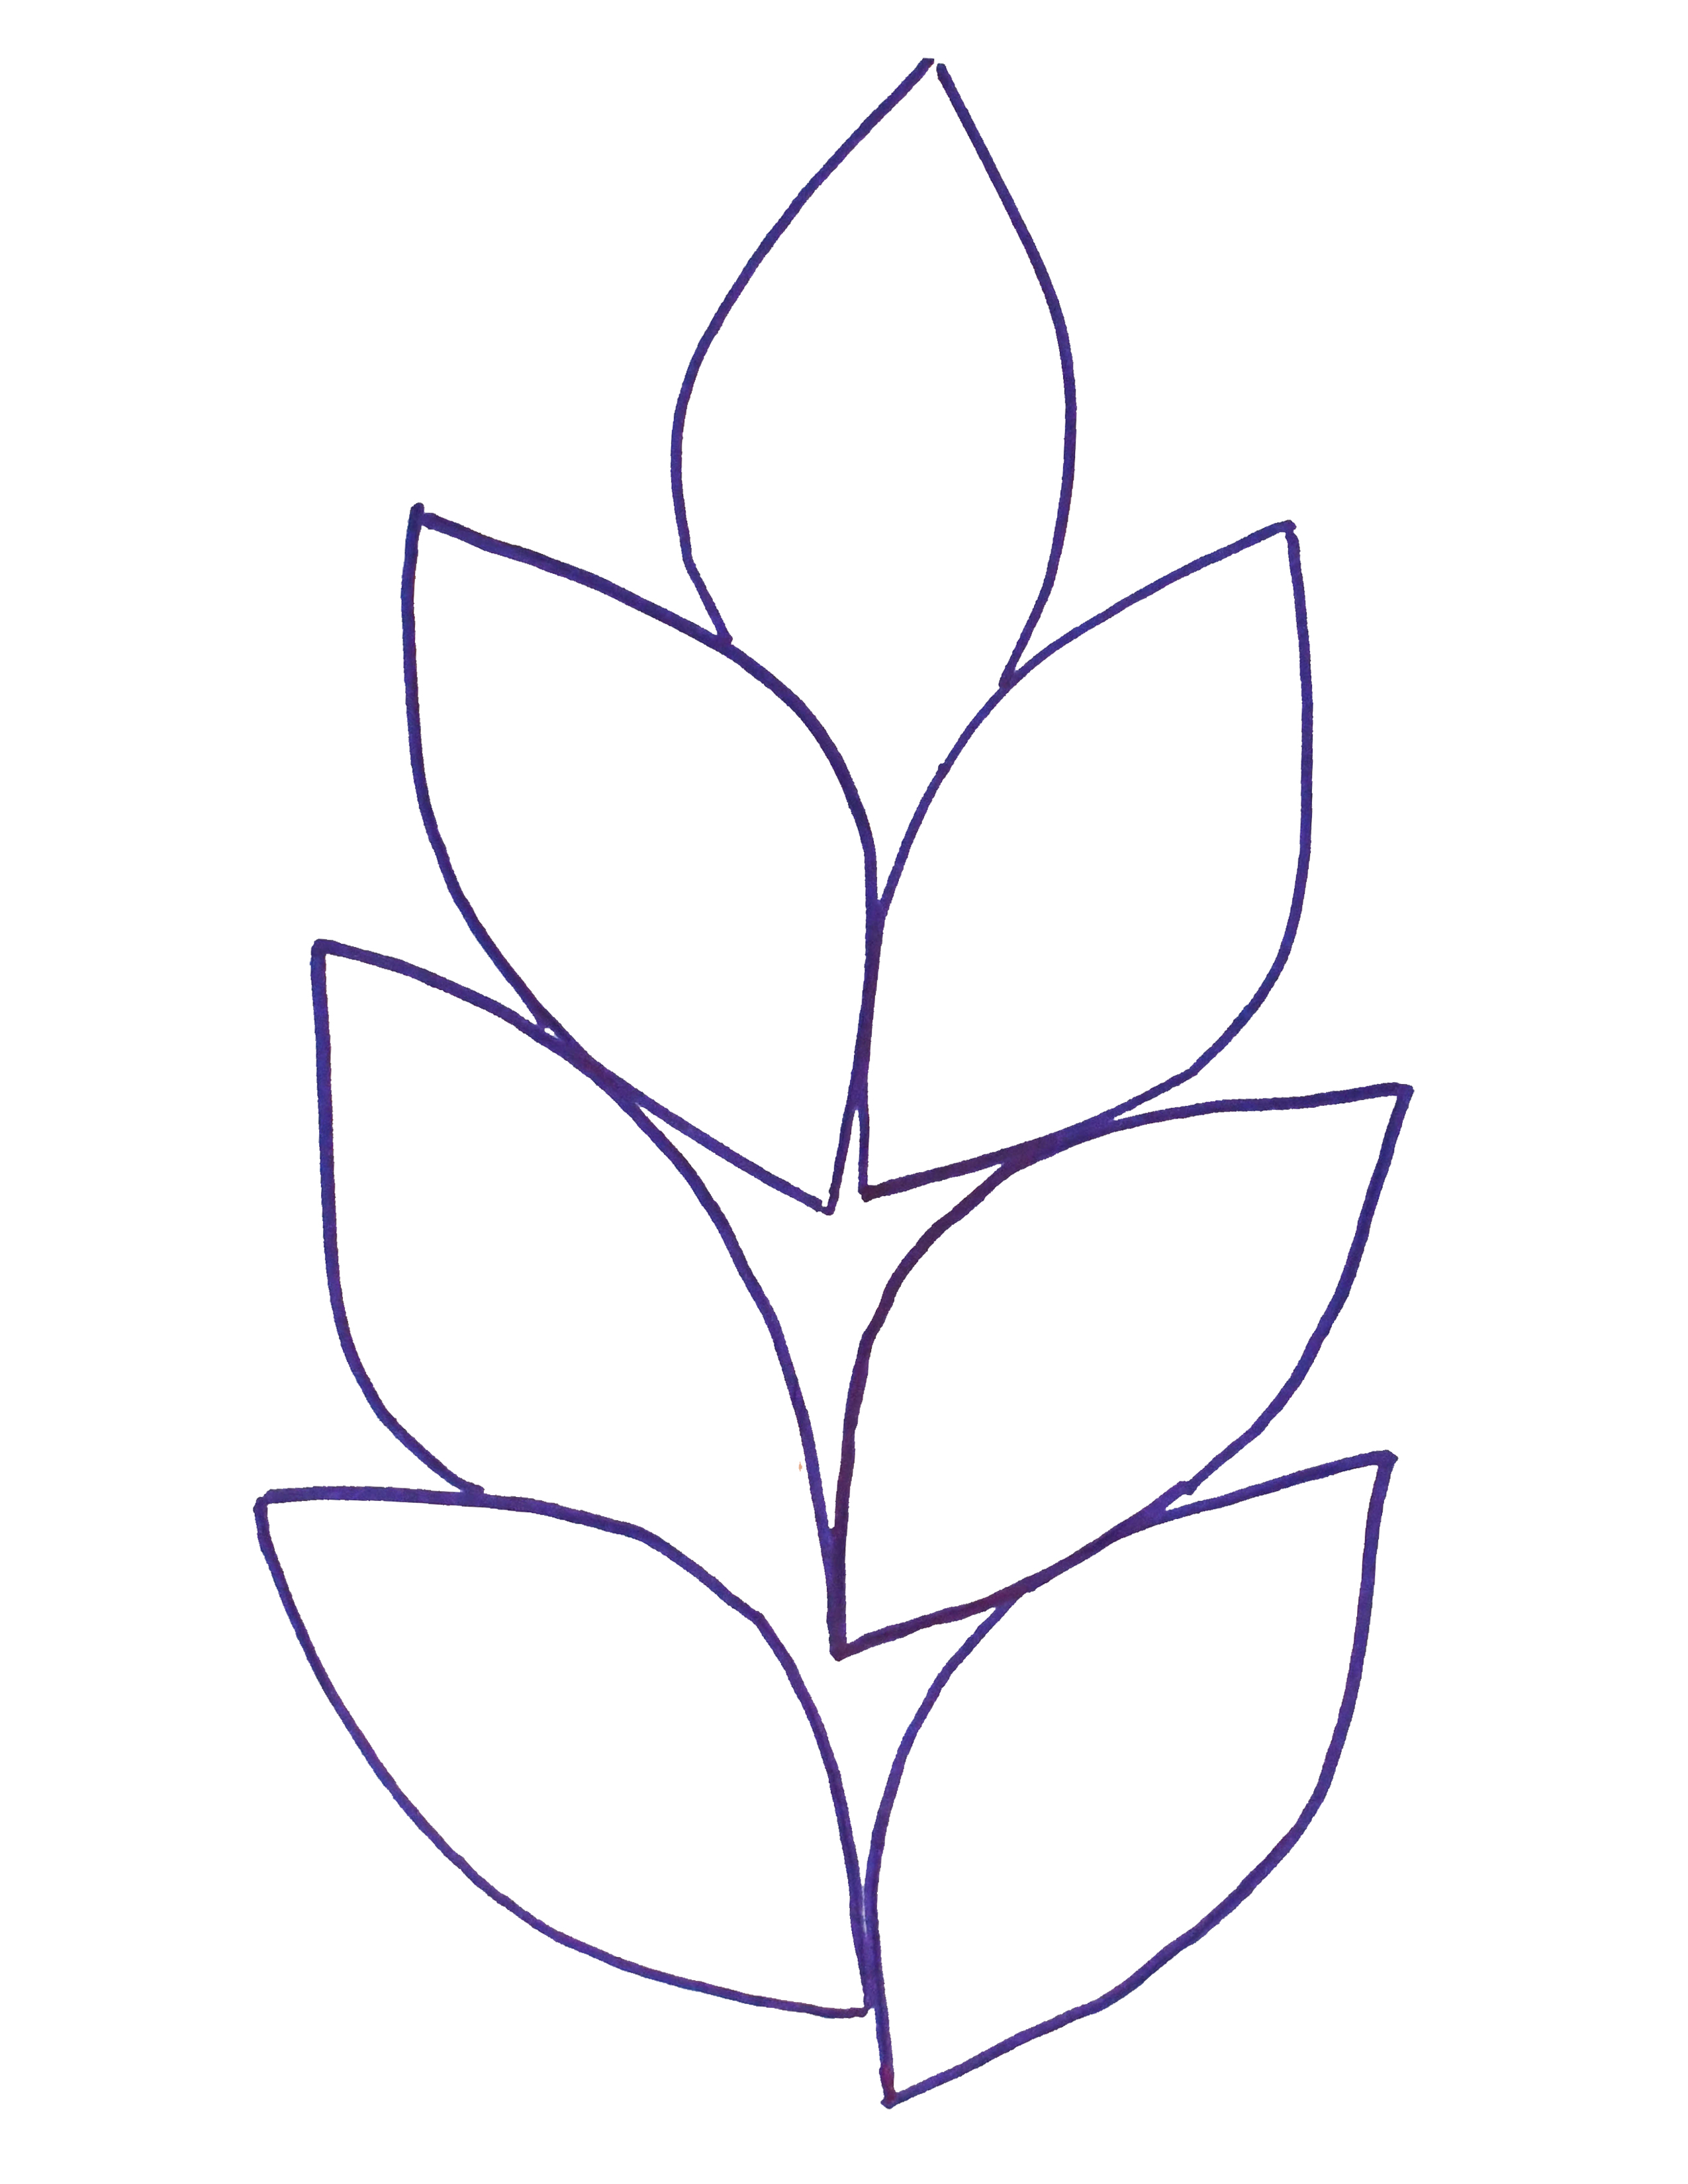 Felt leaf garland printable template